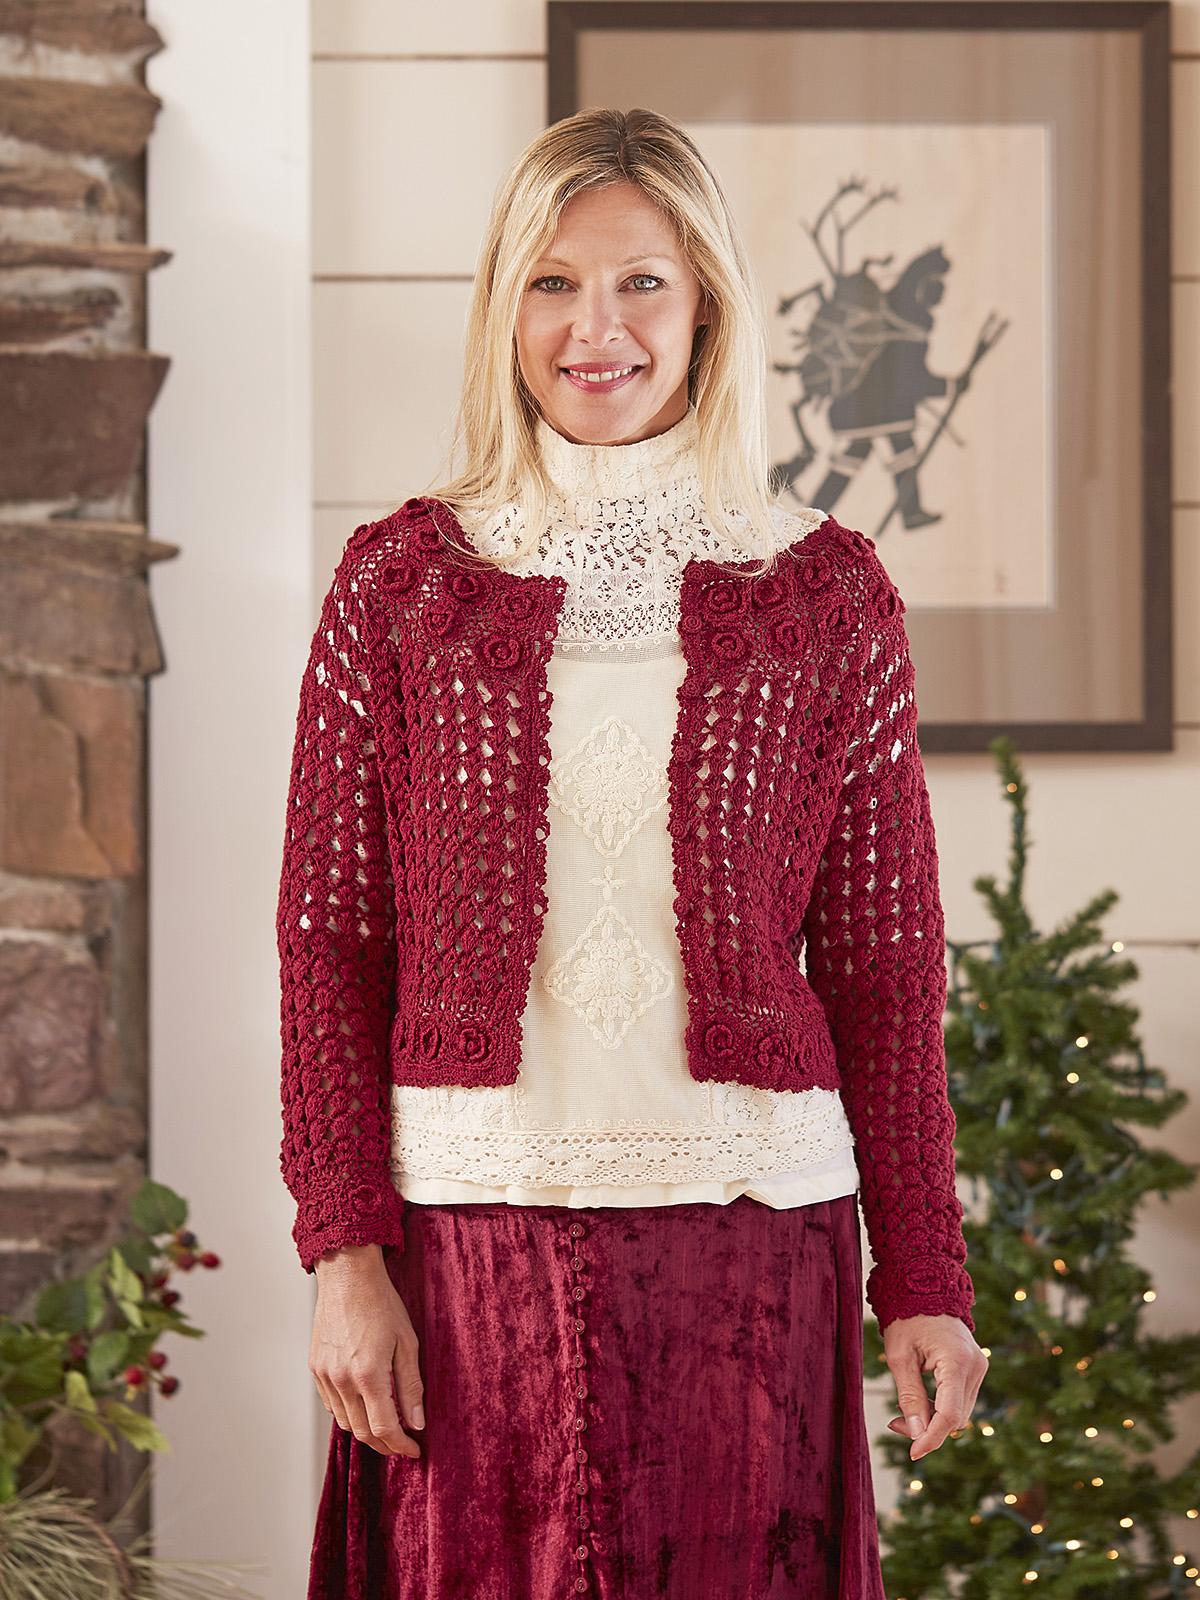 Heirloom Crochet Sweater